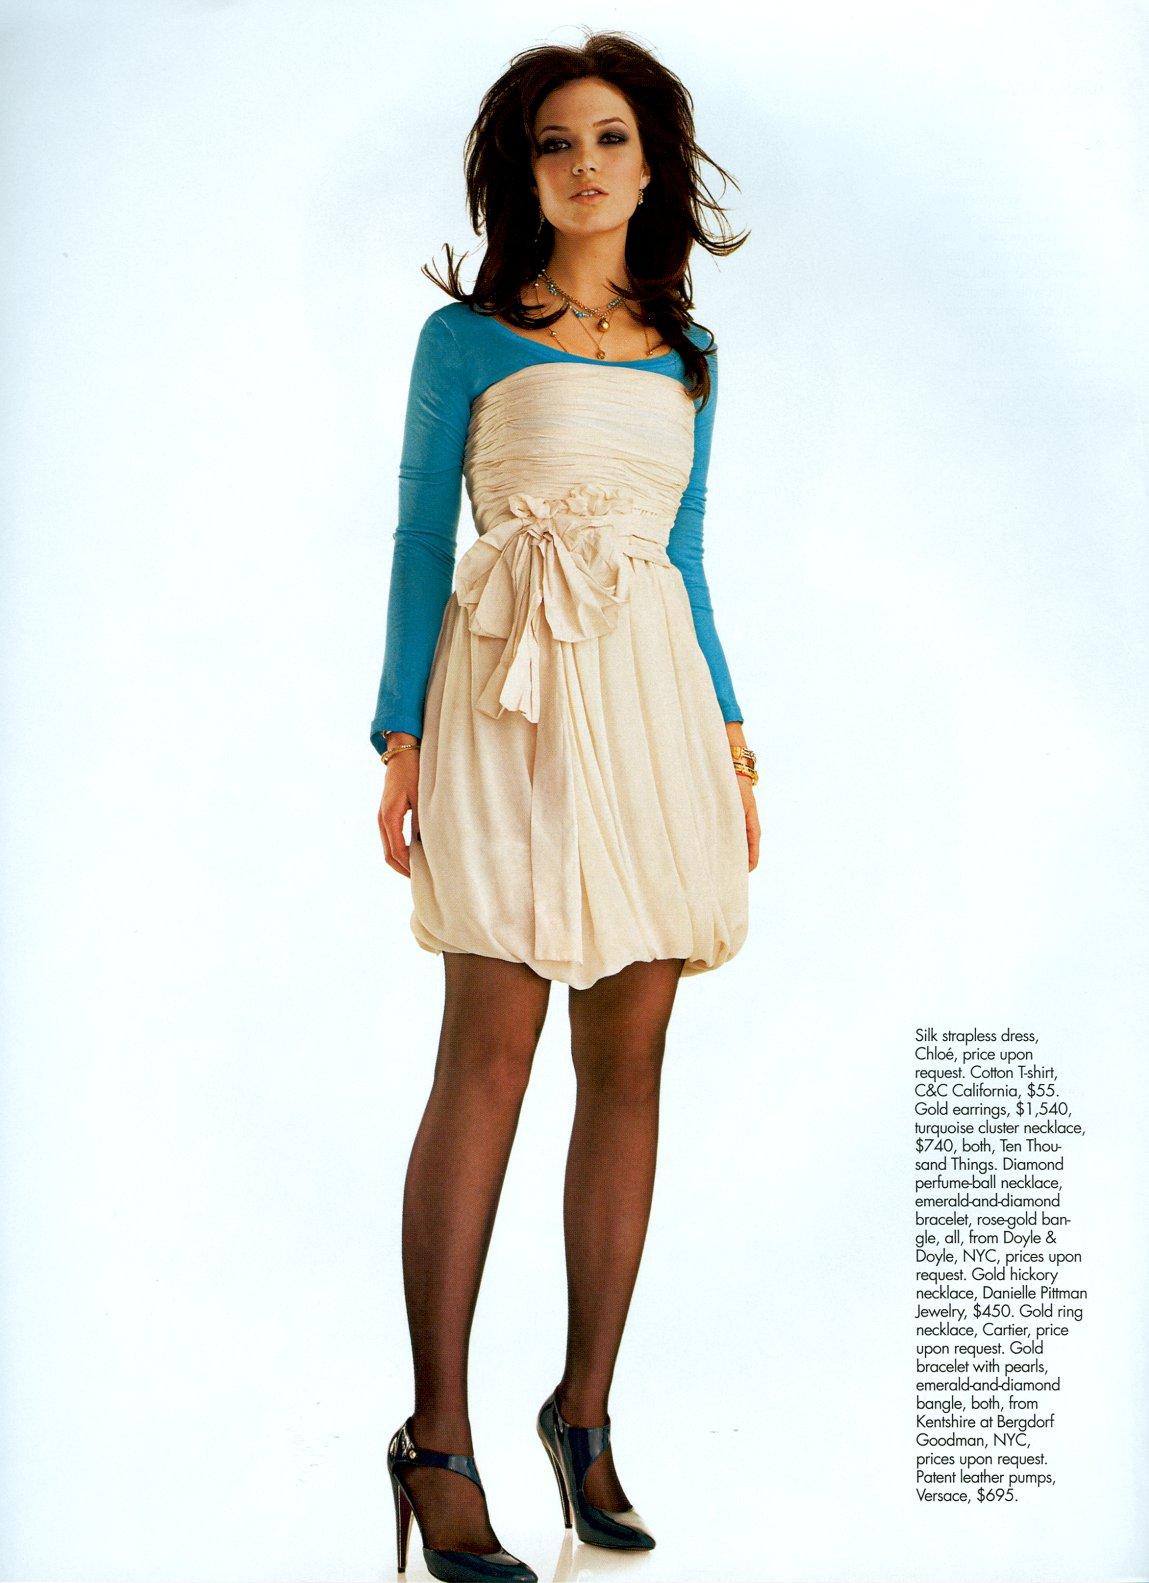 http://3.bp.blogspot.com/_GCAuqodmOE4/TRJnOOCVbtI/AAAAAAAAF6c/Zs6AWZ_Kb5I/s1600/Sexiest+Mandy+Moore++%25289%2529.jpg